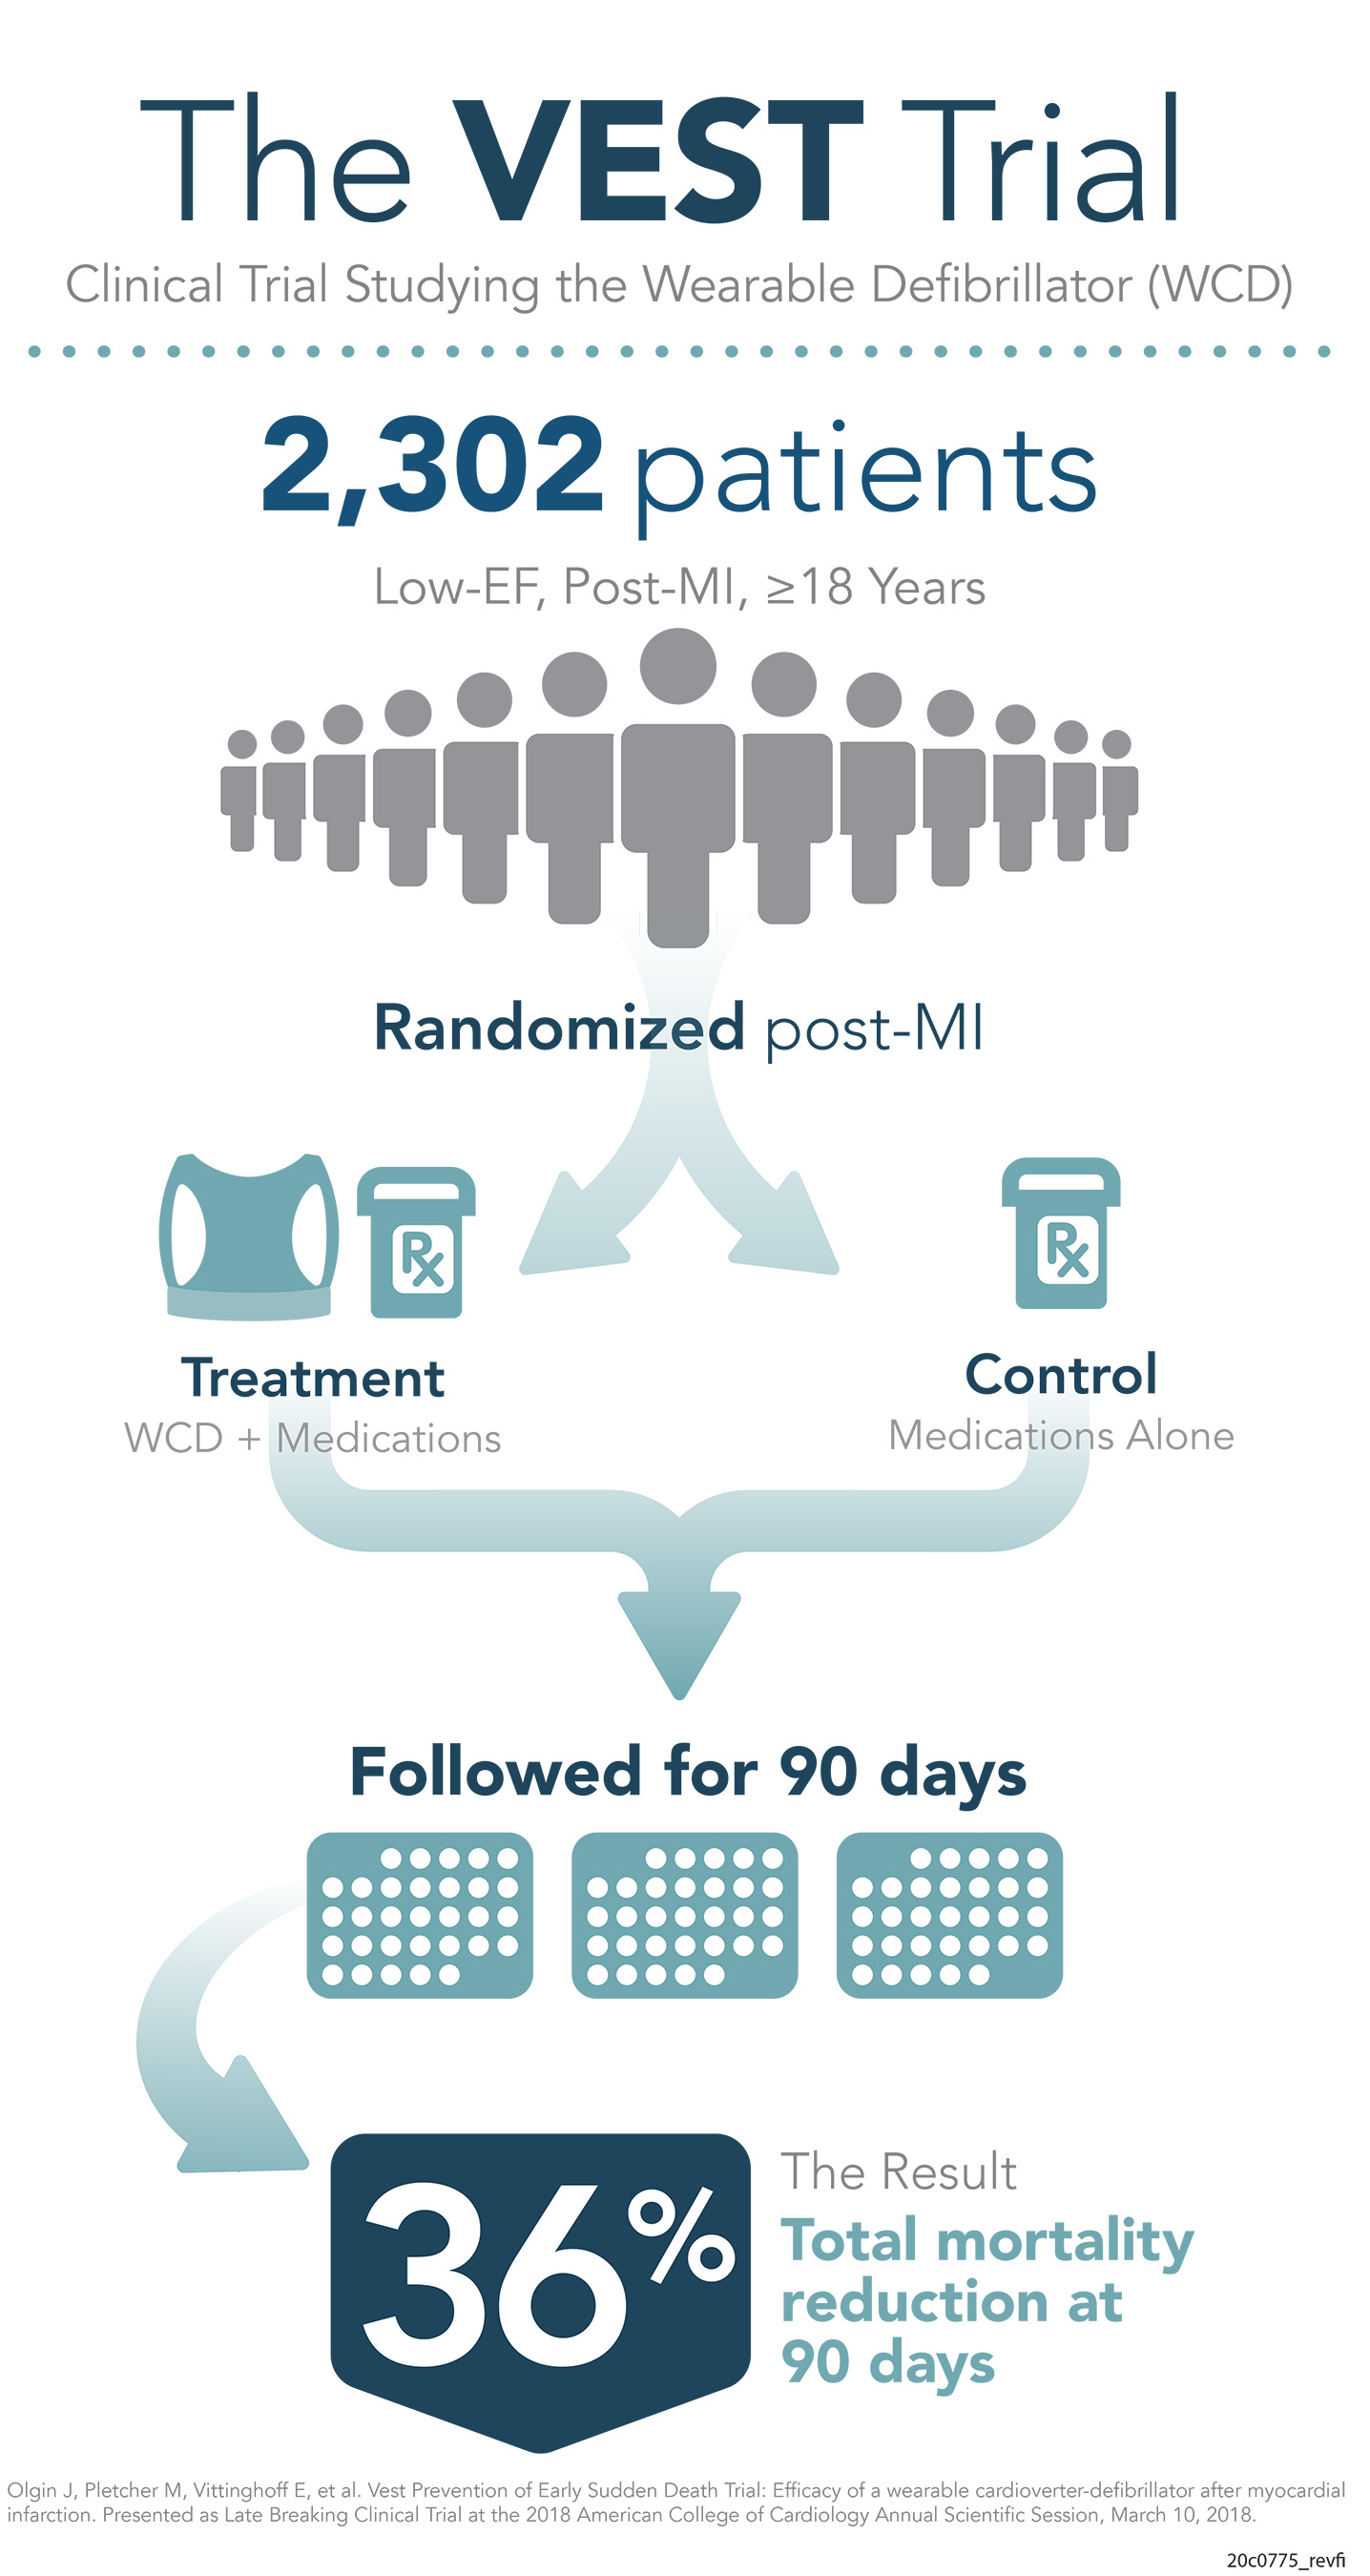 VEST Trial Infographic